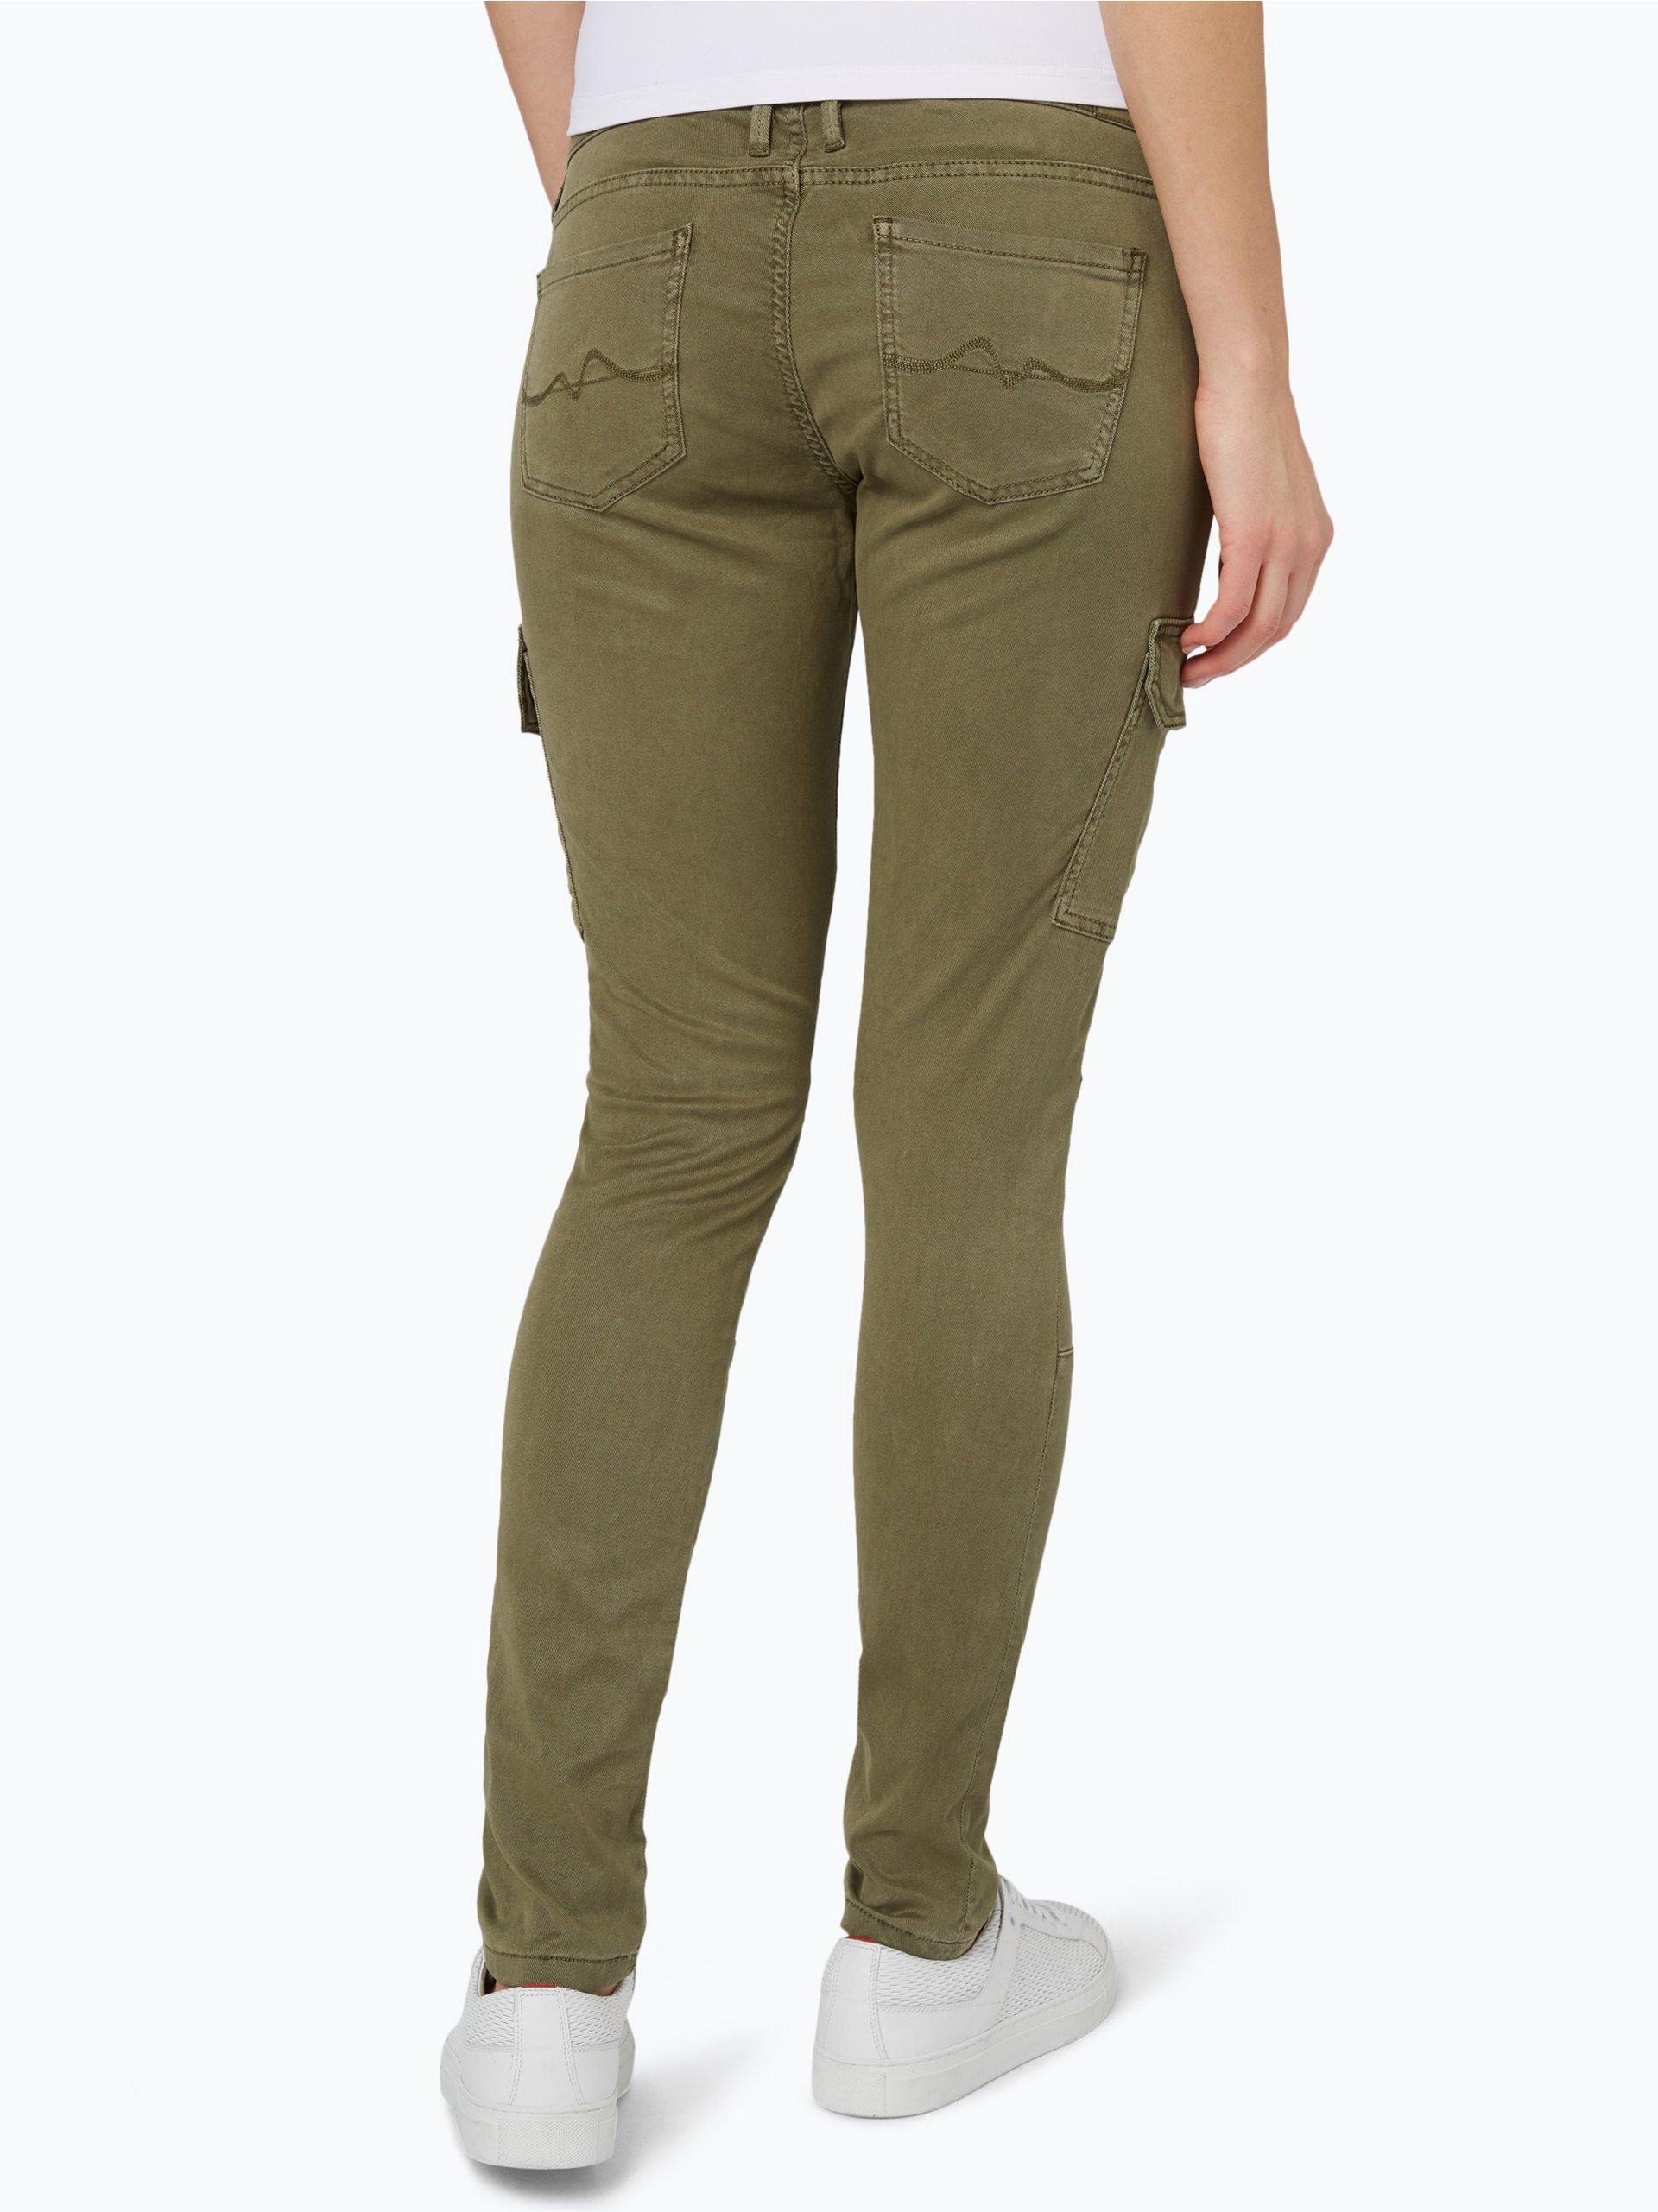 pepe jeans damen hose survivor 2 online kaufen peek und cloppenburg de. Black Bedroom Furniture Sets. Home Design Ideas